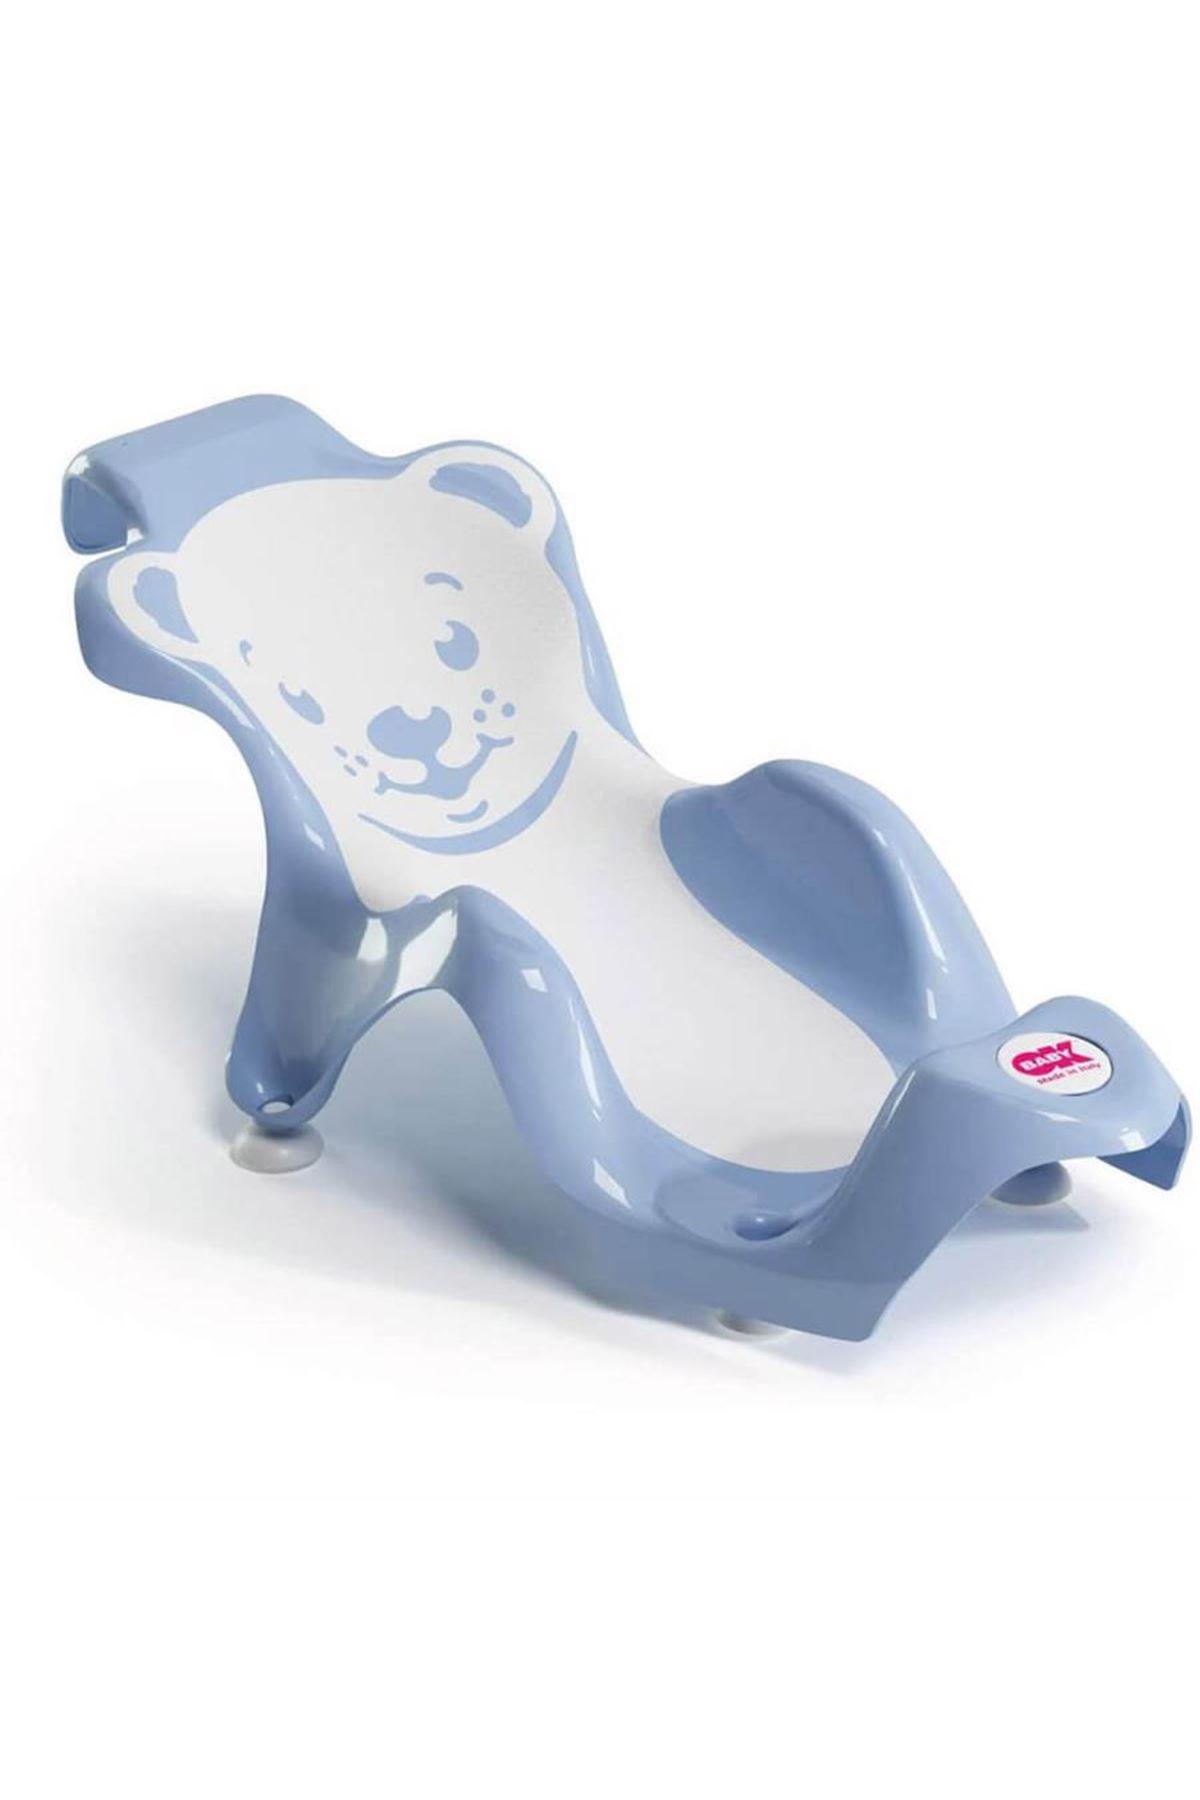 Okbaby Buddy Küvet Aparatı / Mavi